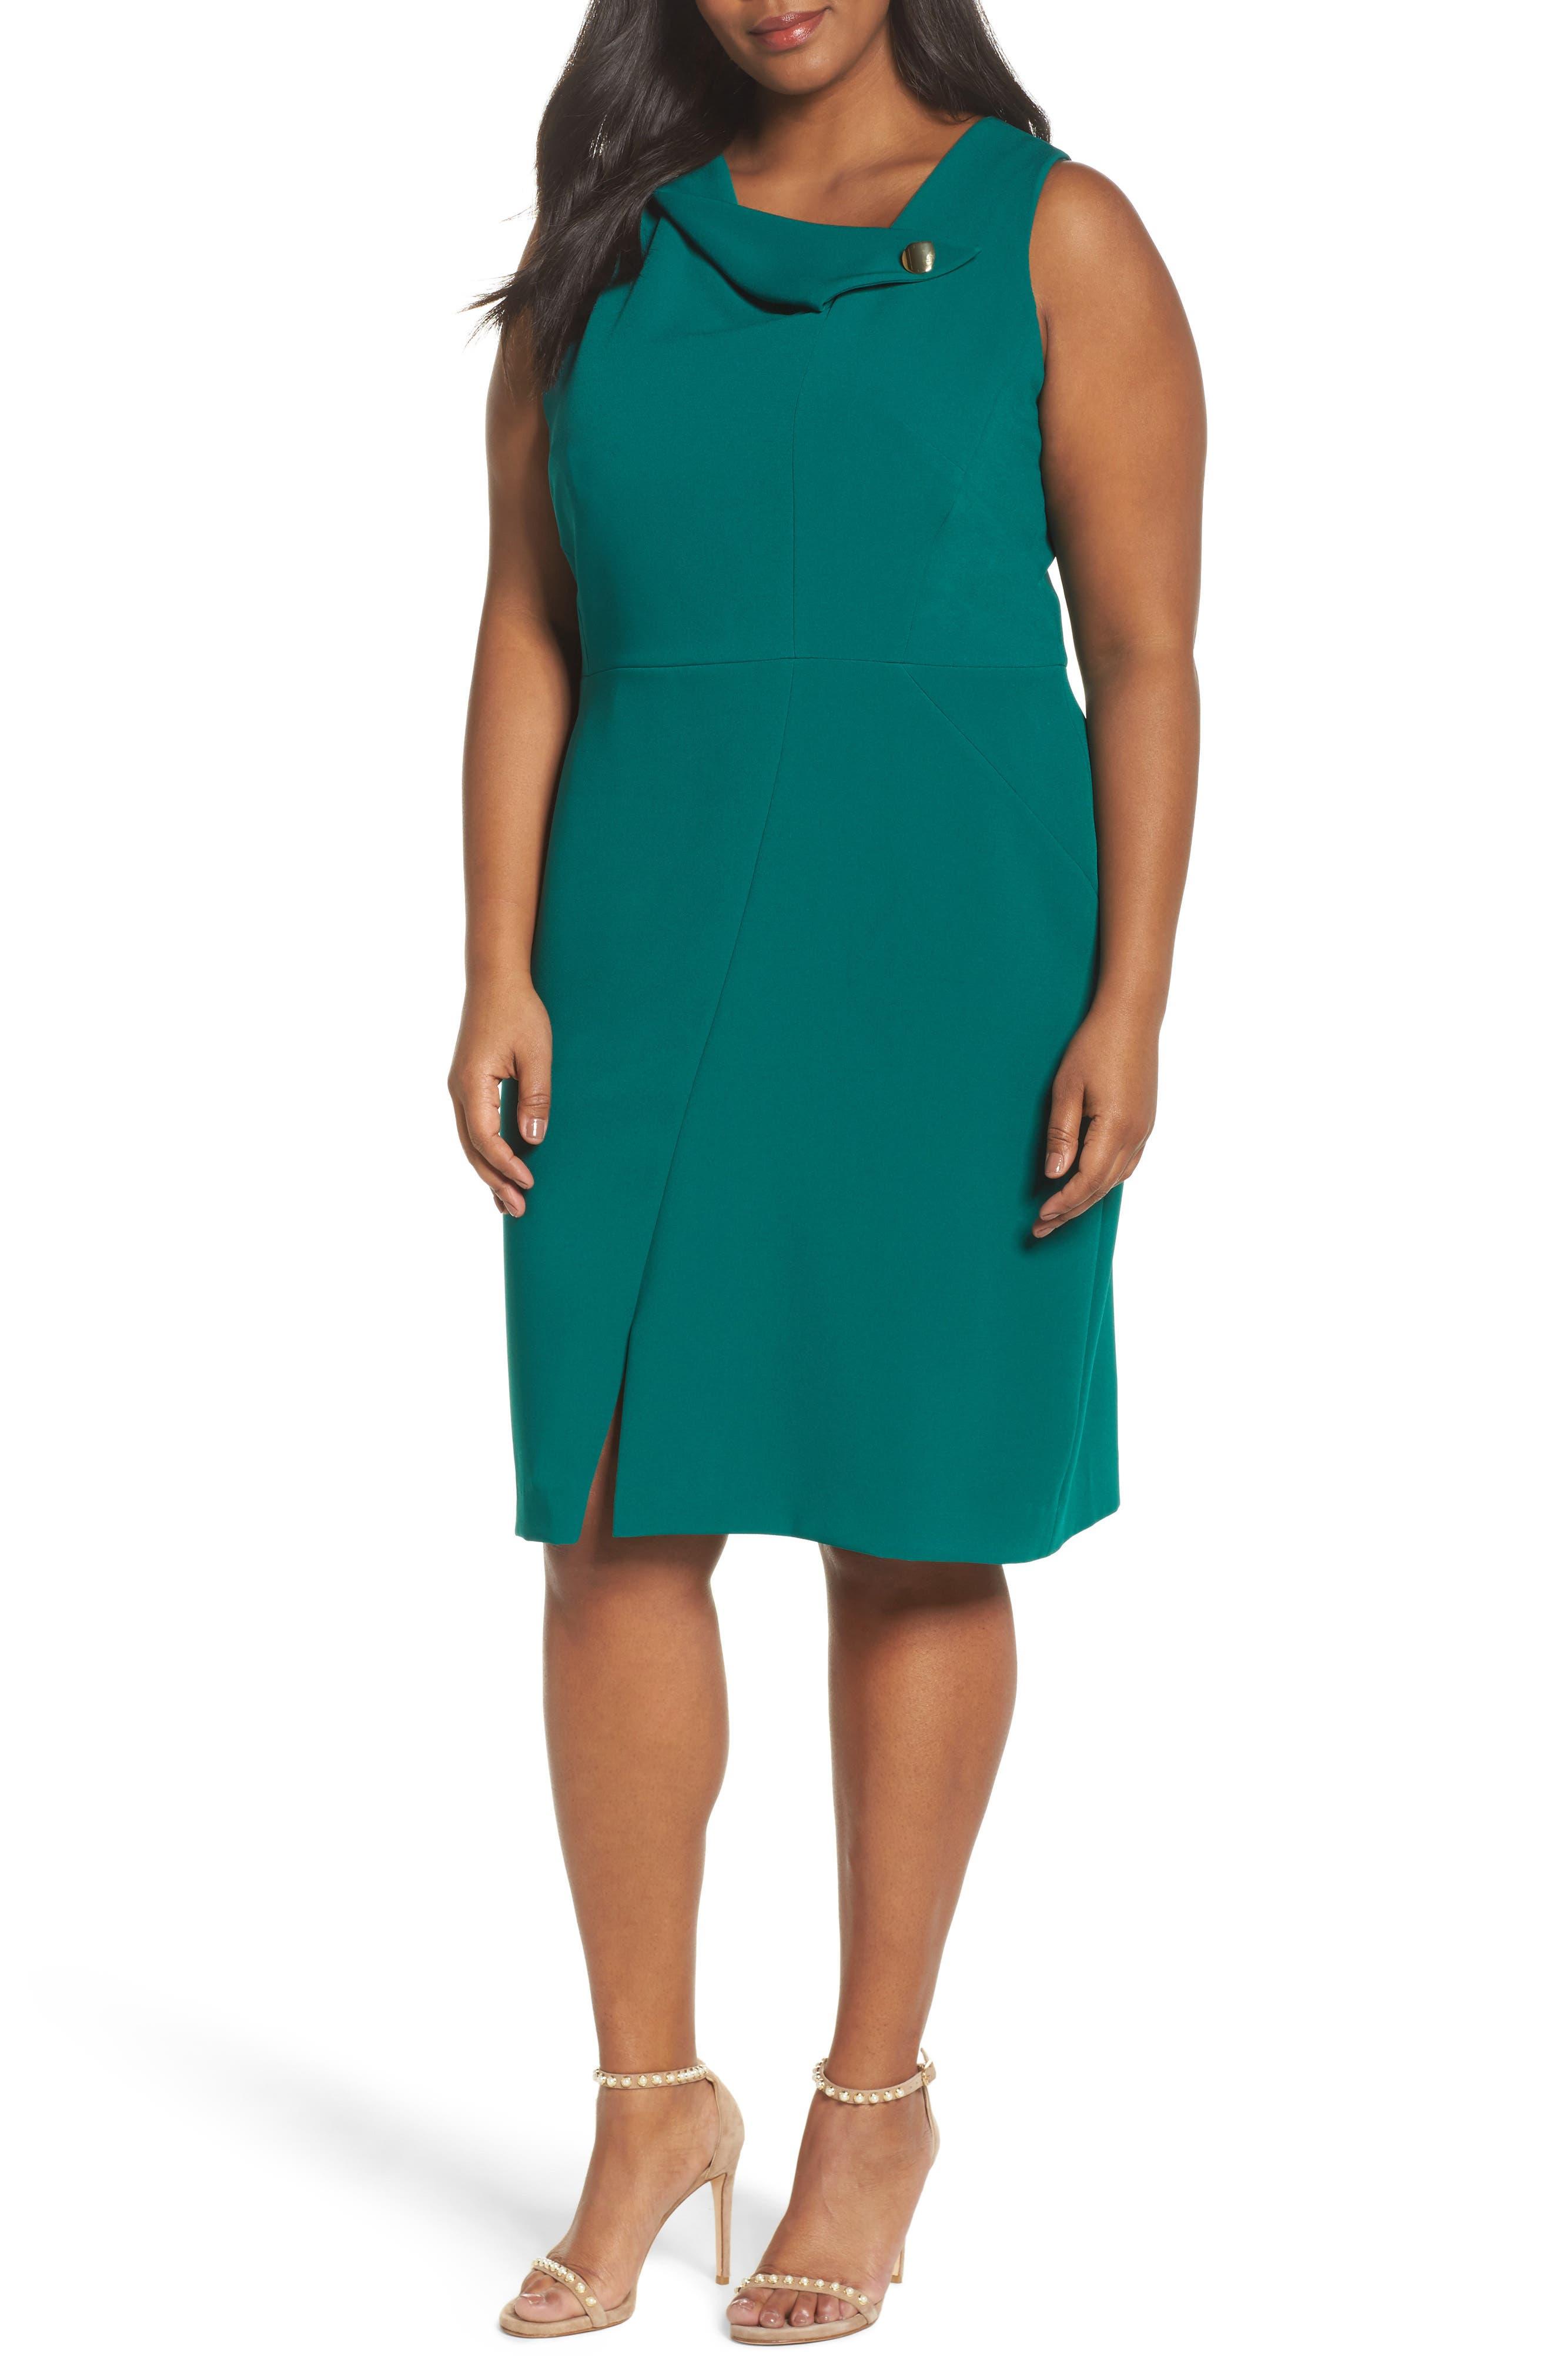 Envelope Neck with Button Sheath Dress,                             Main thumbnail 1, color,                             307